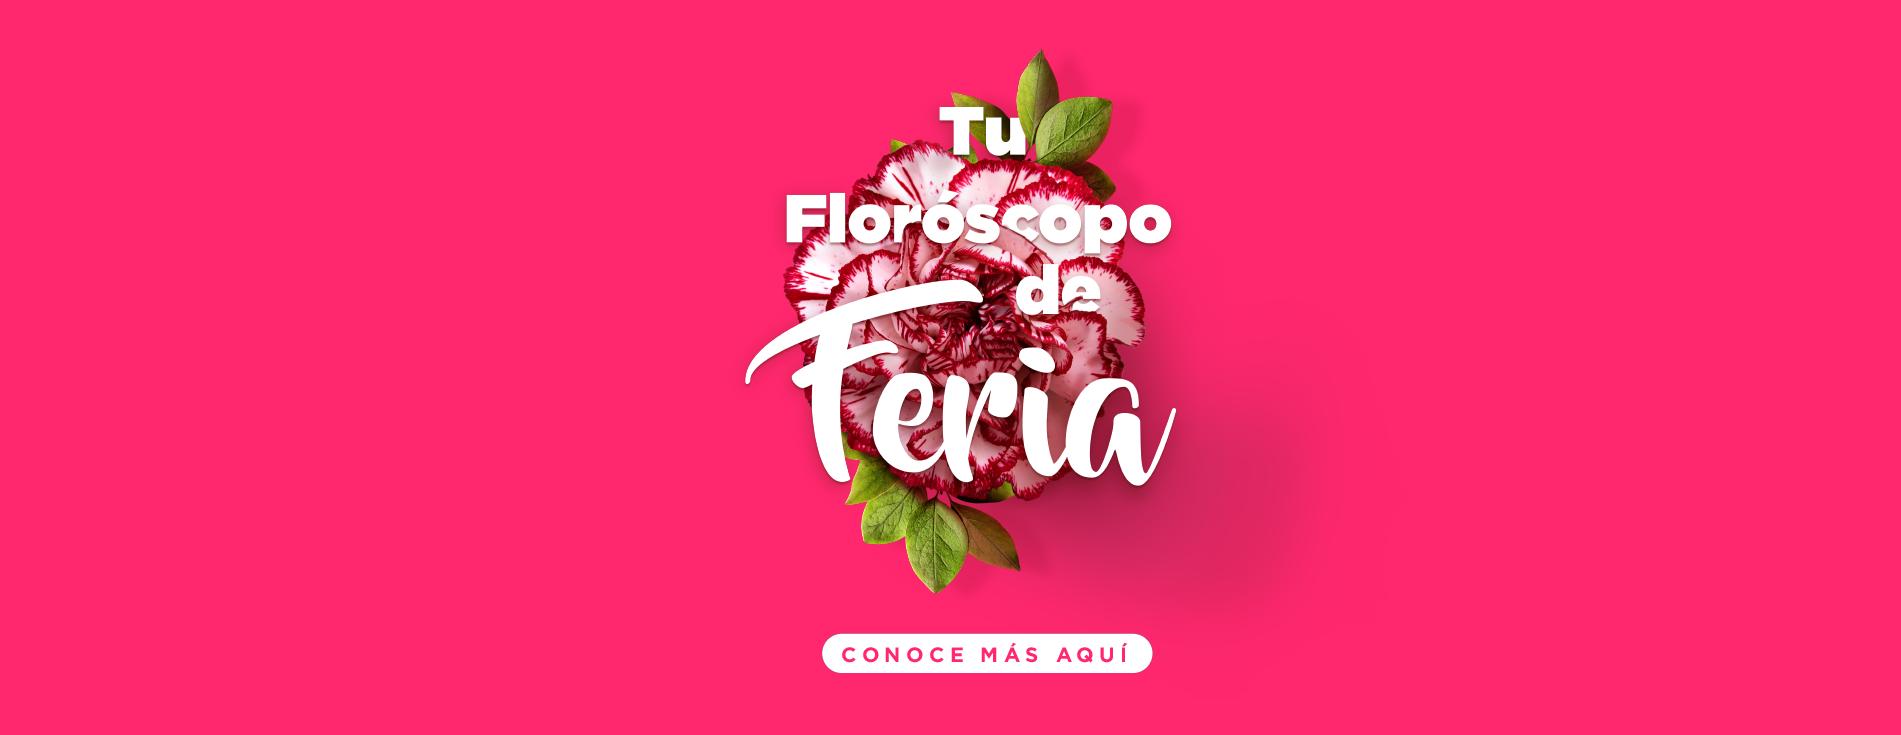 Floróscopo - La ceja